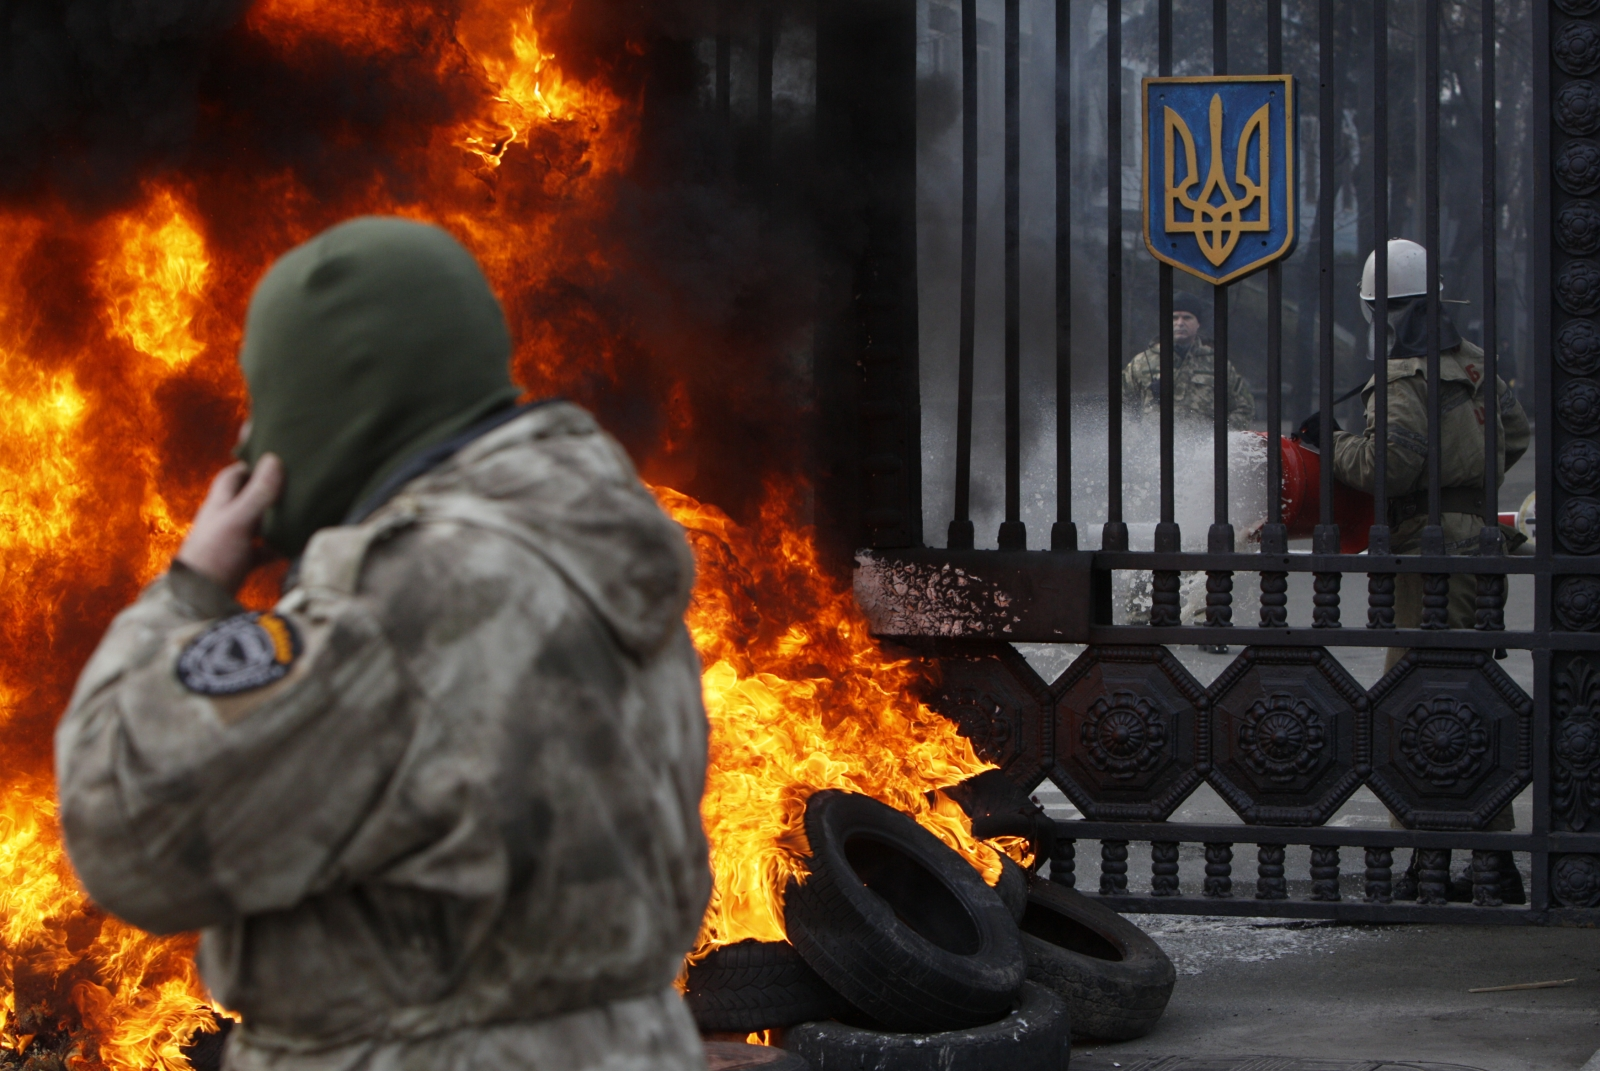 US lethal military aid to Ukraine